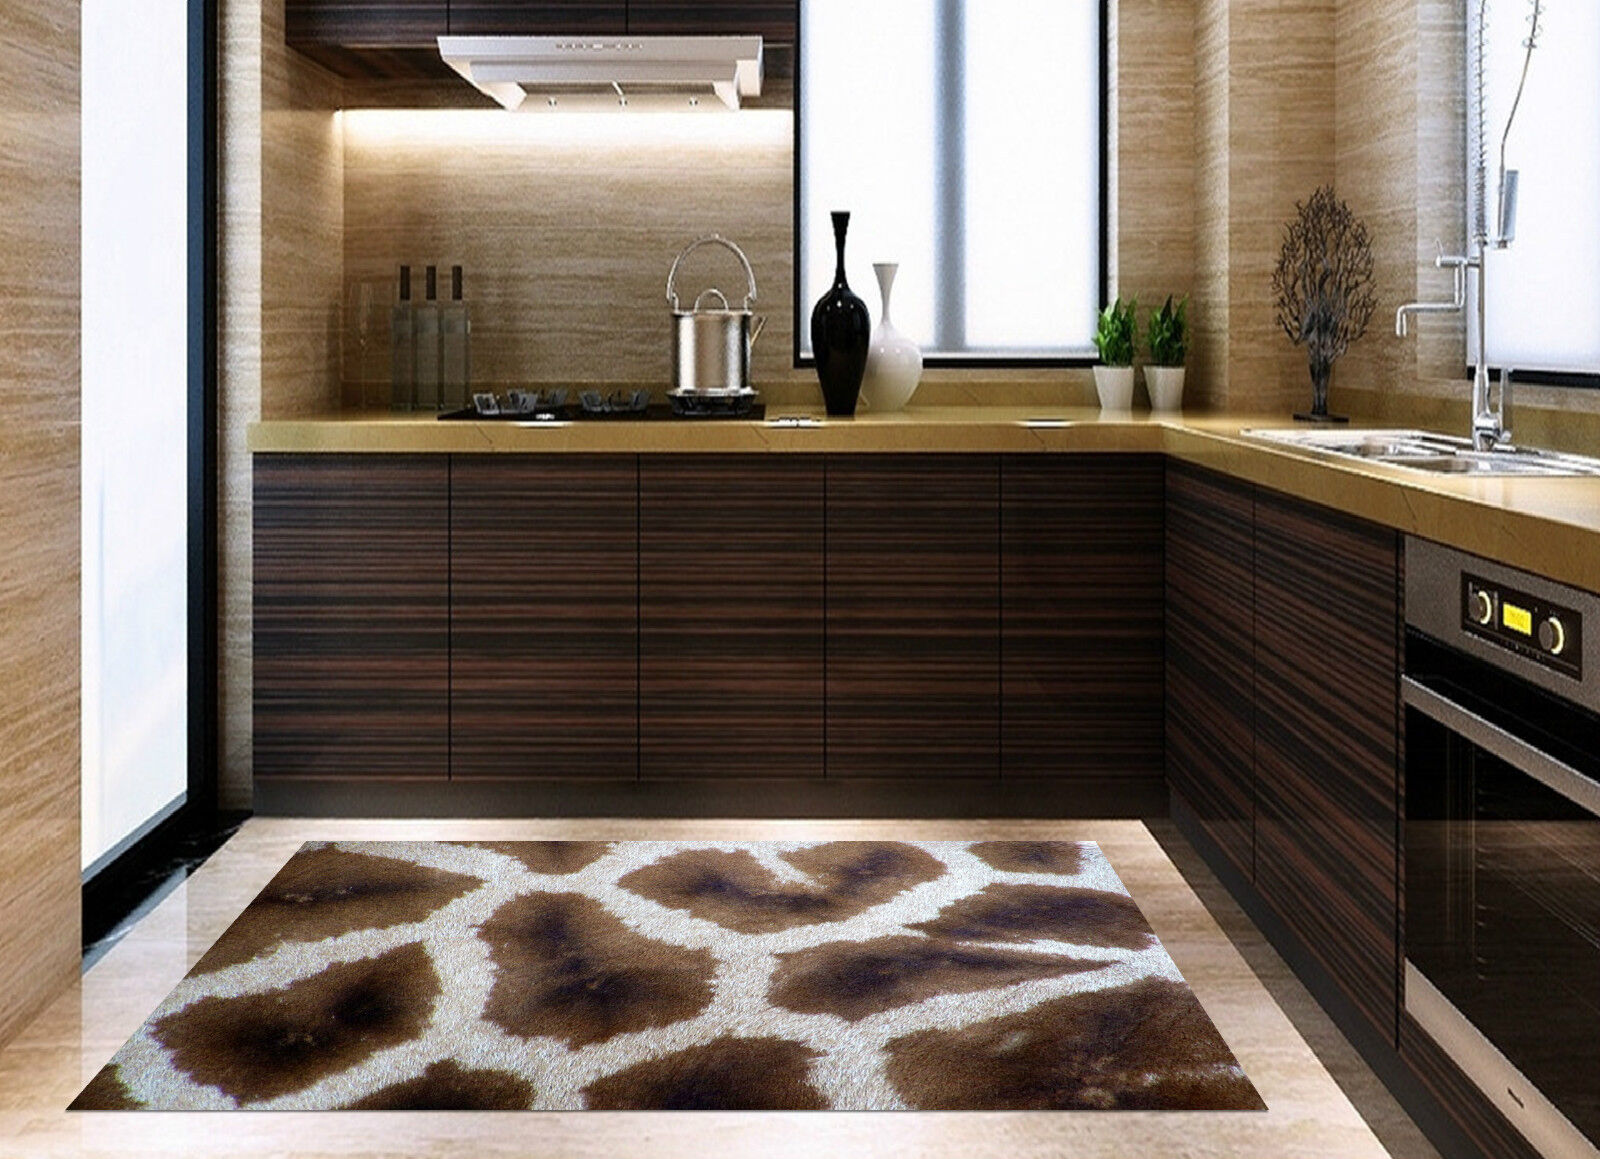 3D Fashion Spots Kitchen Mat Floor Murals Wall Print Wall Deco AJ WALLPAPER CA